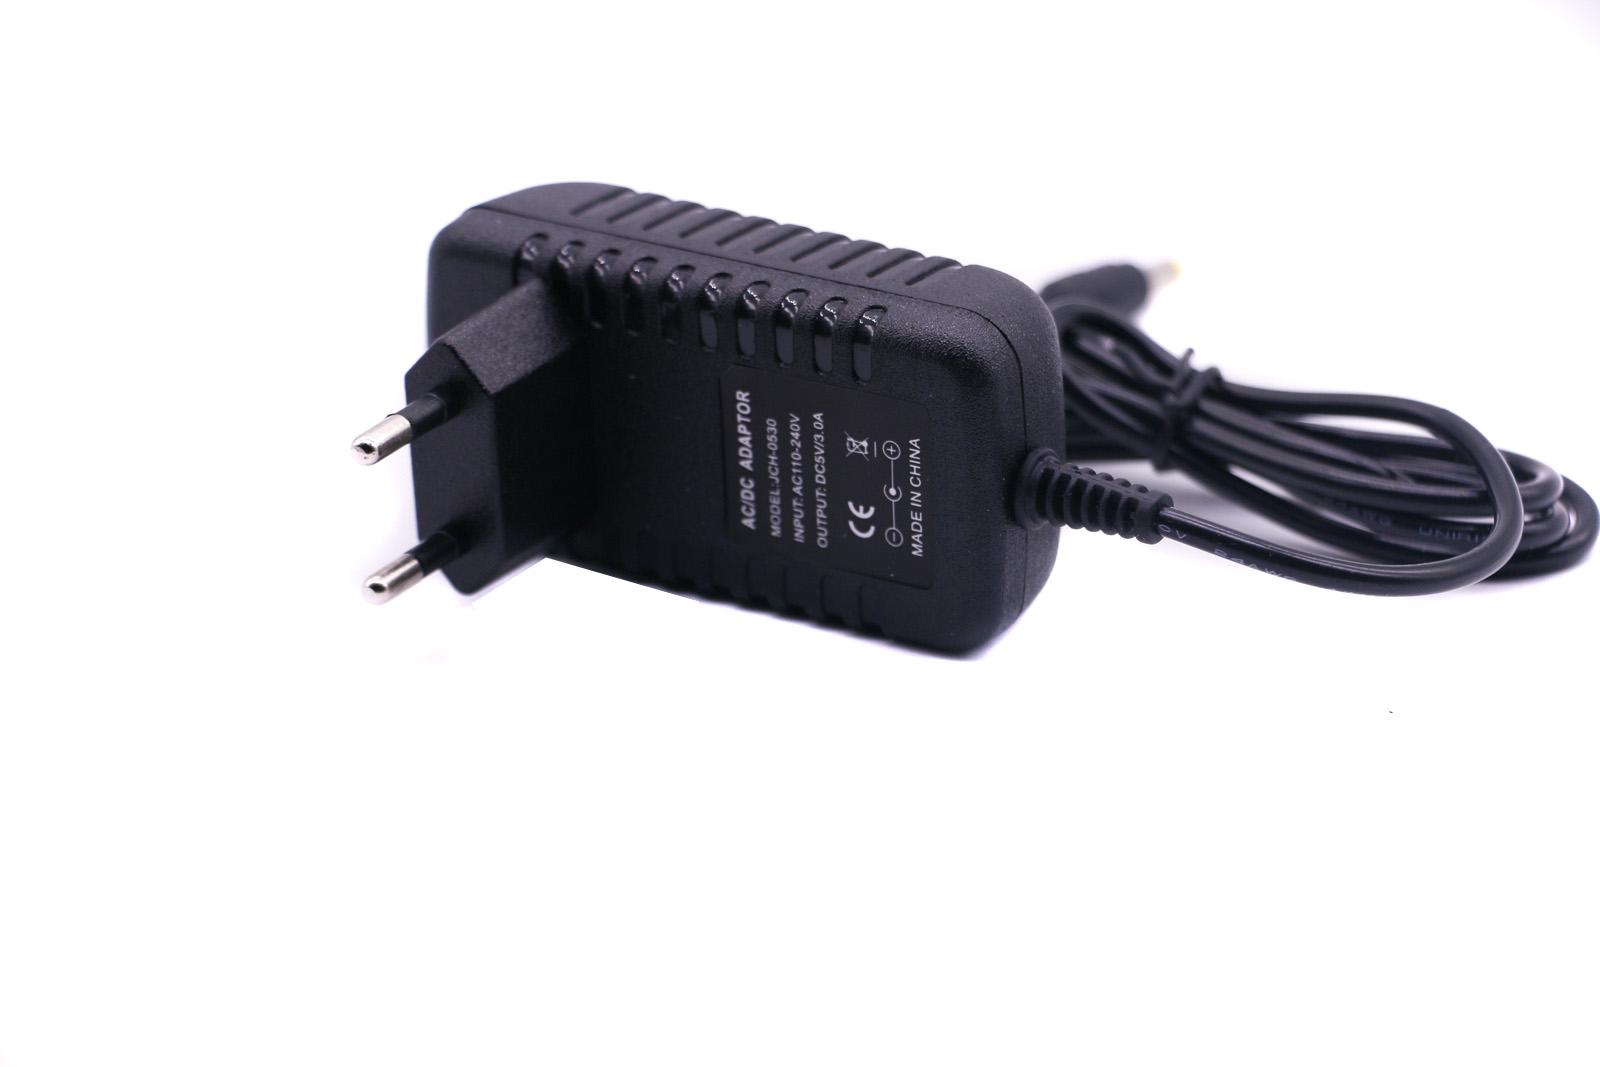 Ac To Dc 12v 5v 9v 24v Power Supply 2a 3a 5a Adaptor Eu Uk Au Plug For Led Light Ebay